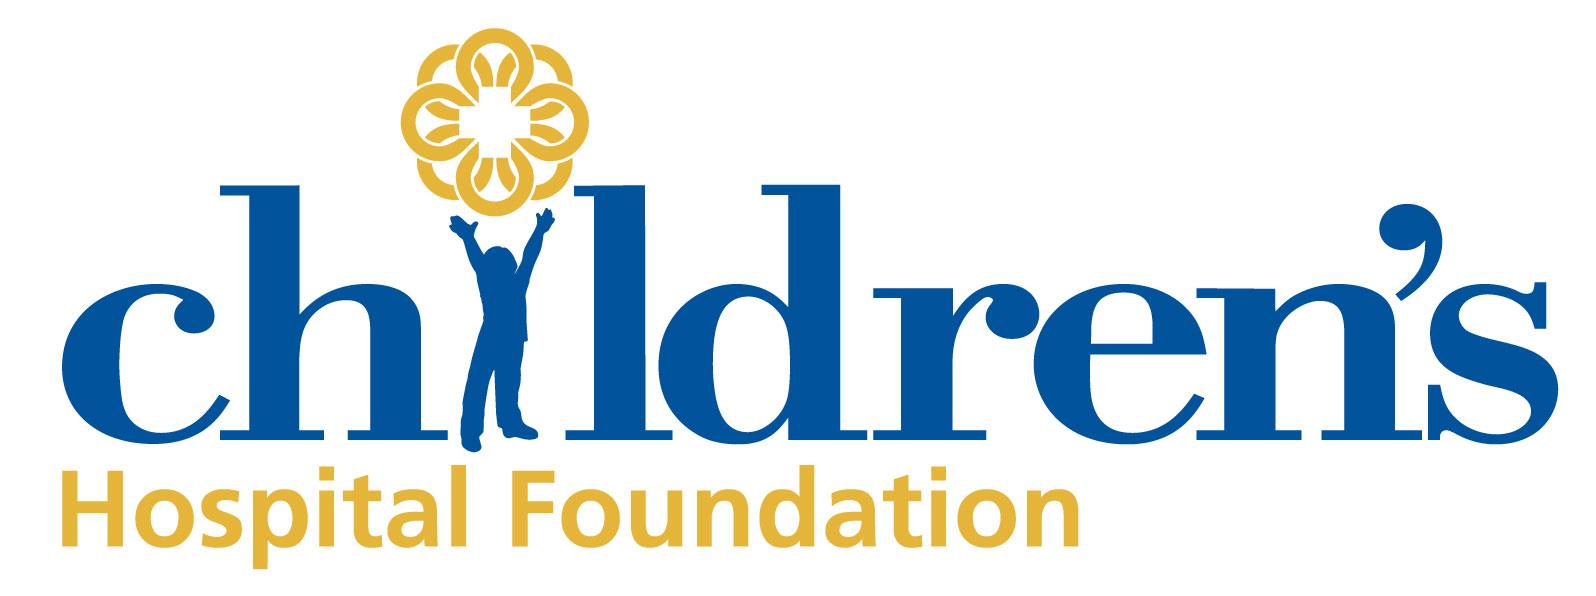 CHE_Foundation_Logo.jpg